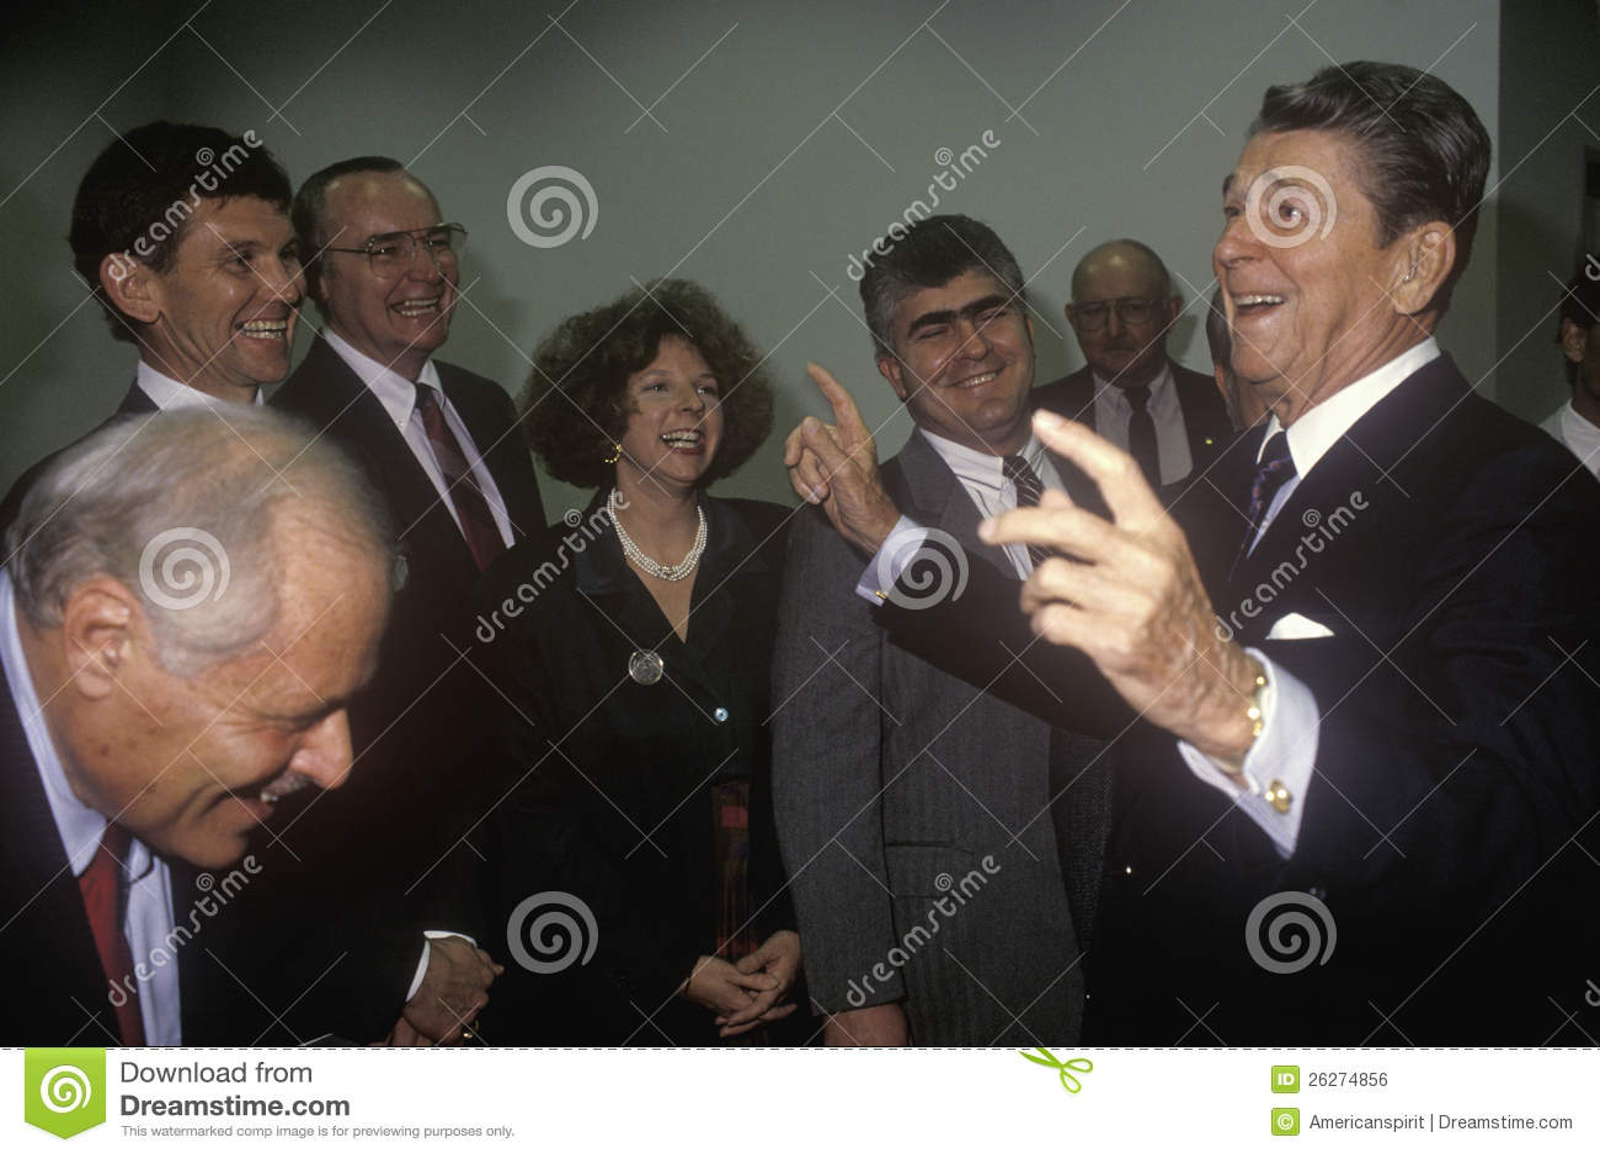 President Ronald Reagan jokes with politicians